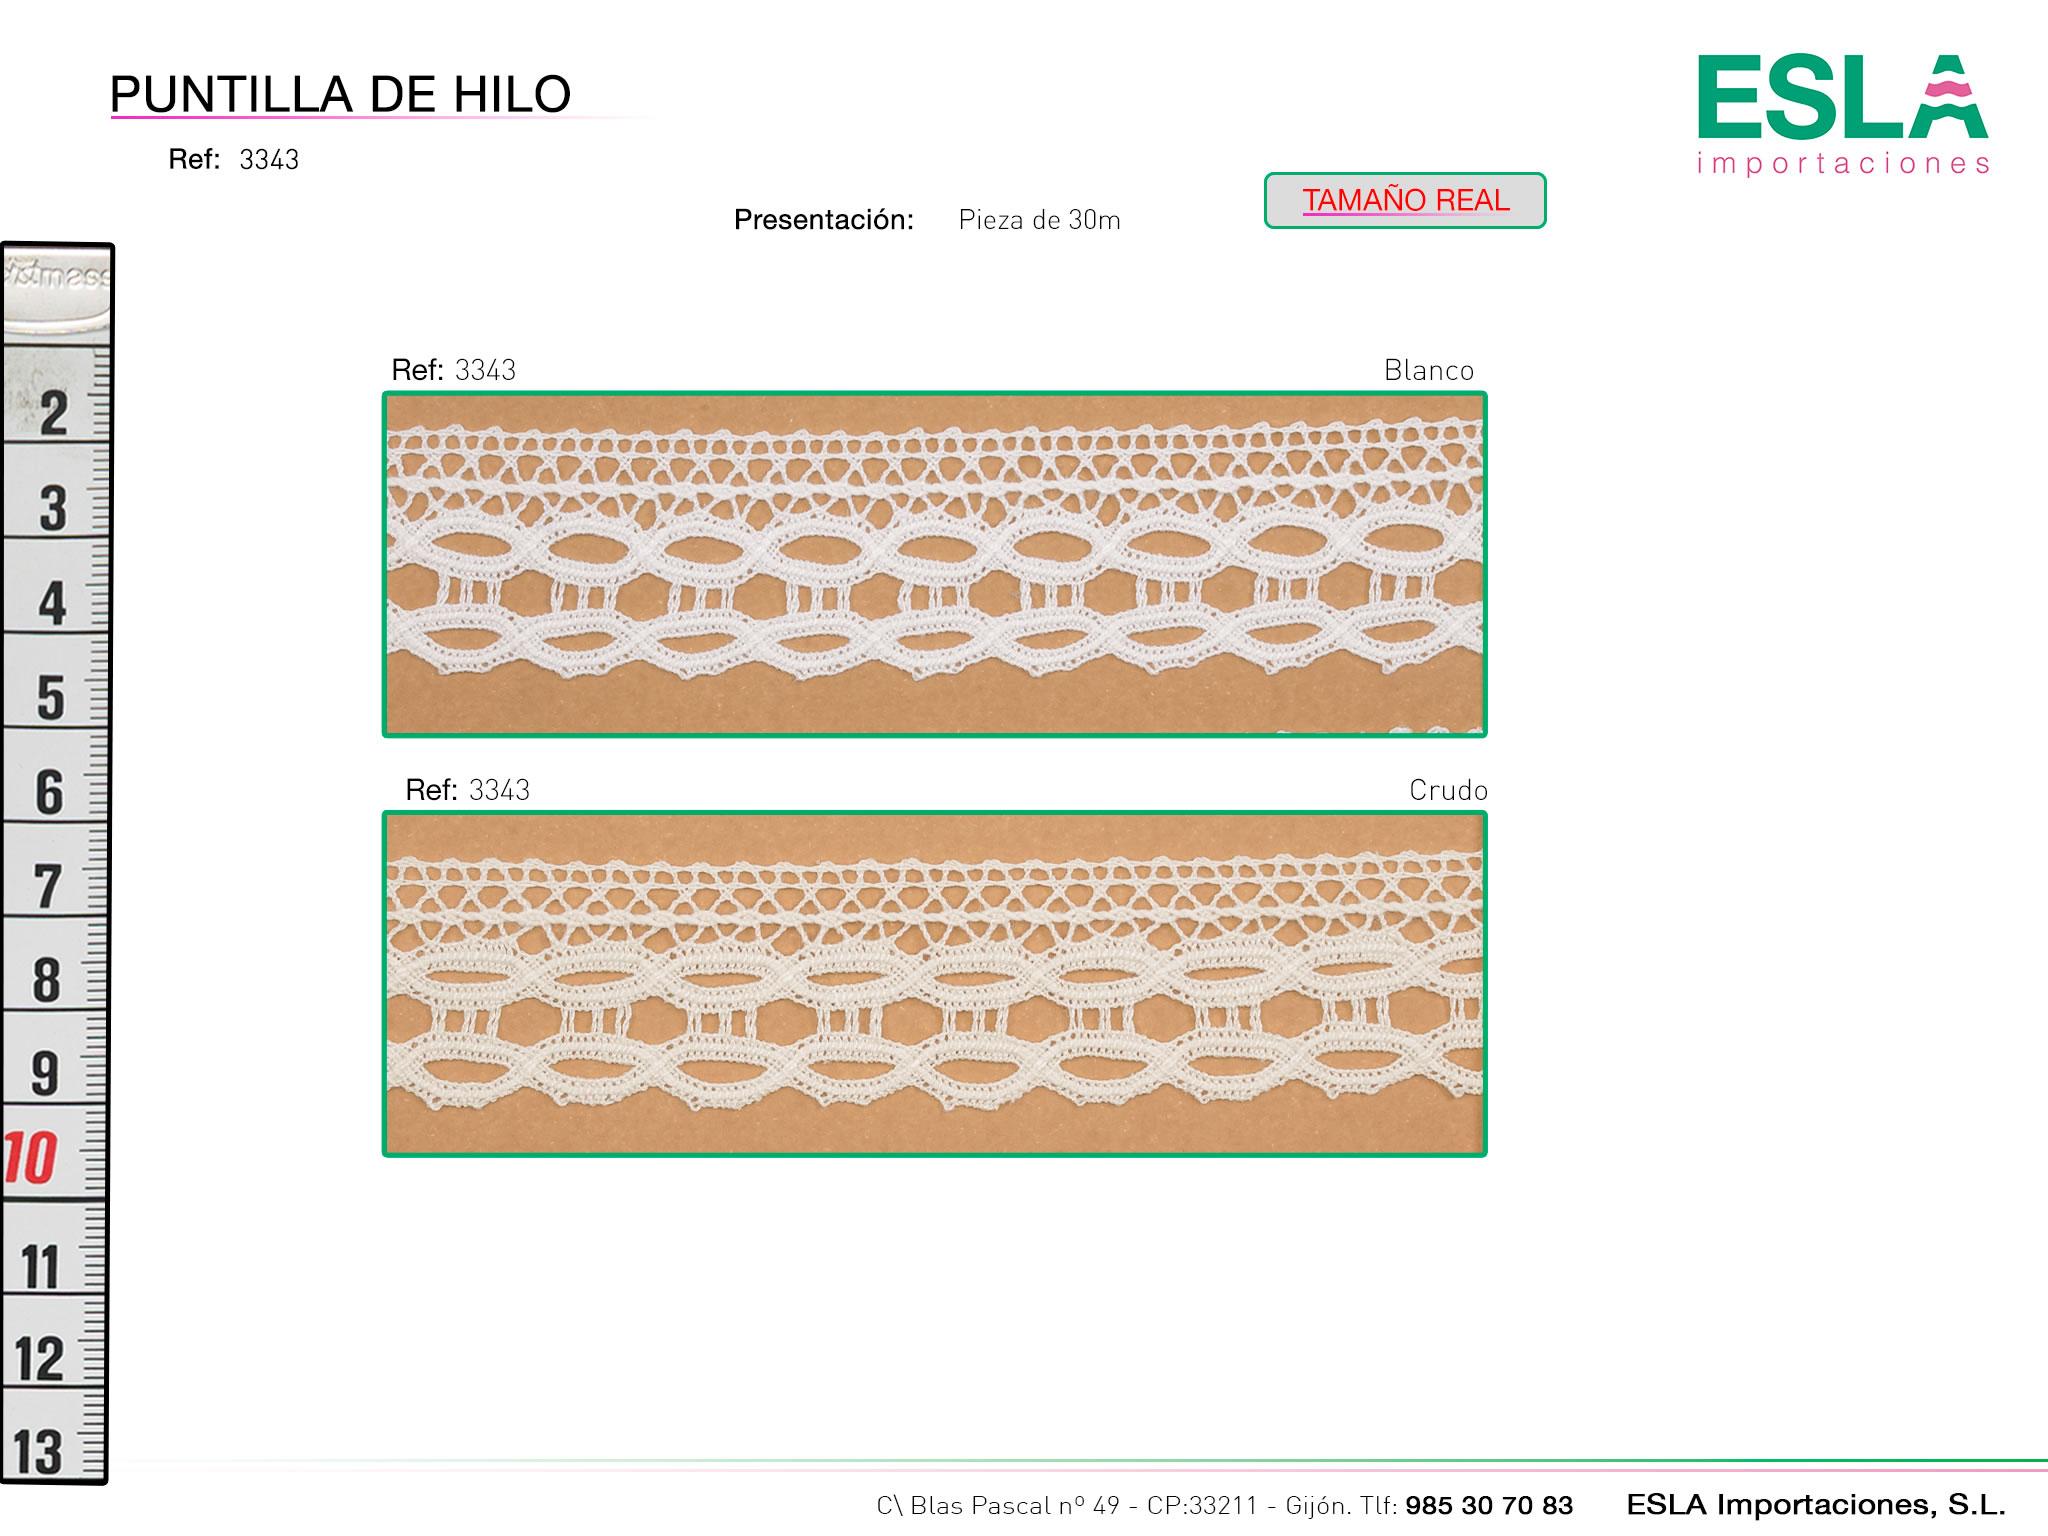 Puntilla de hilo, Familia 3342, Ref 3343